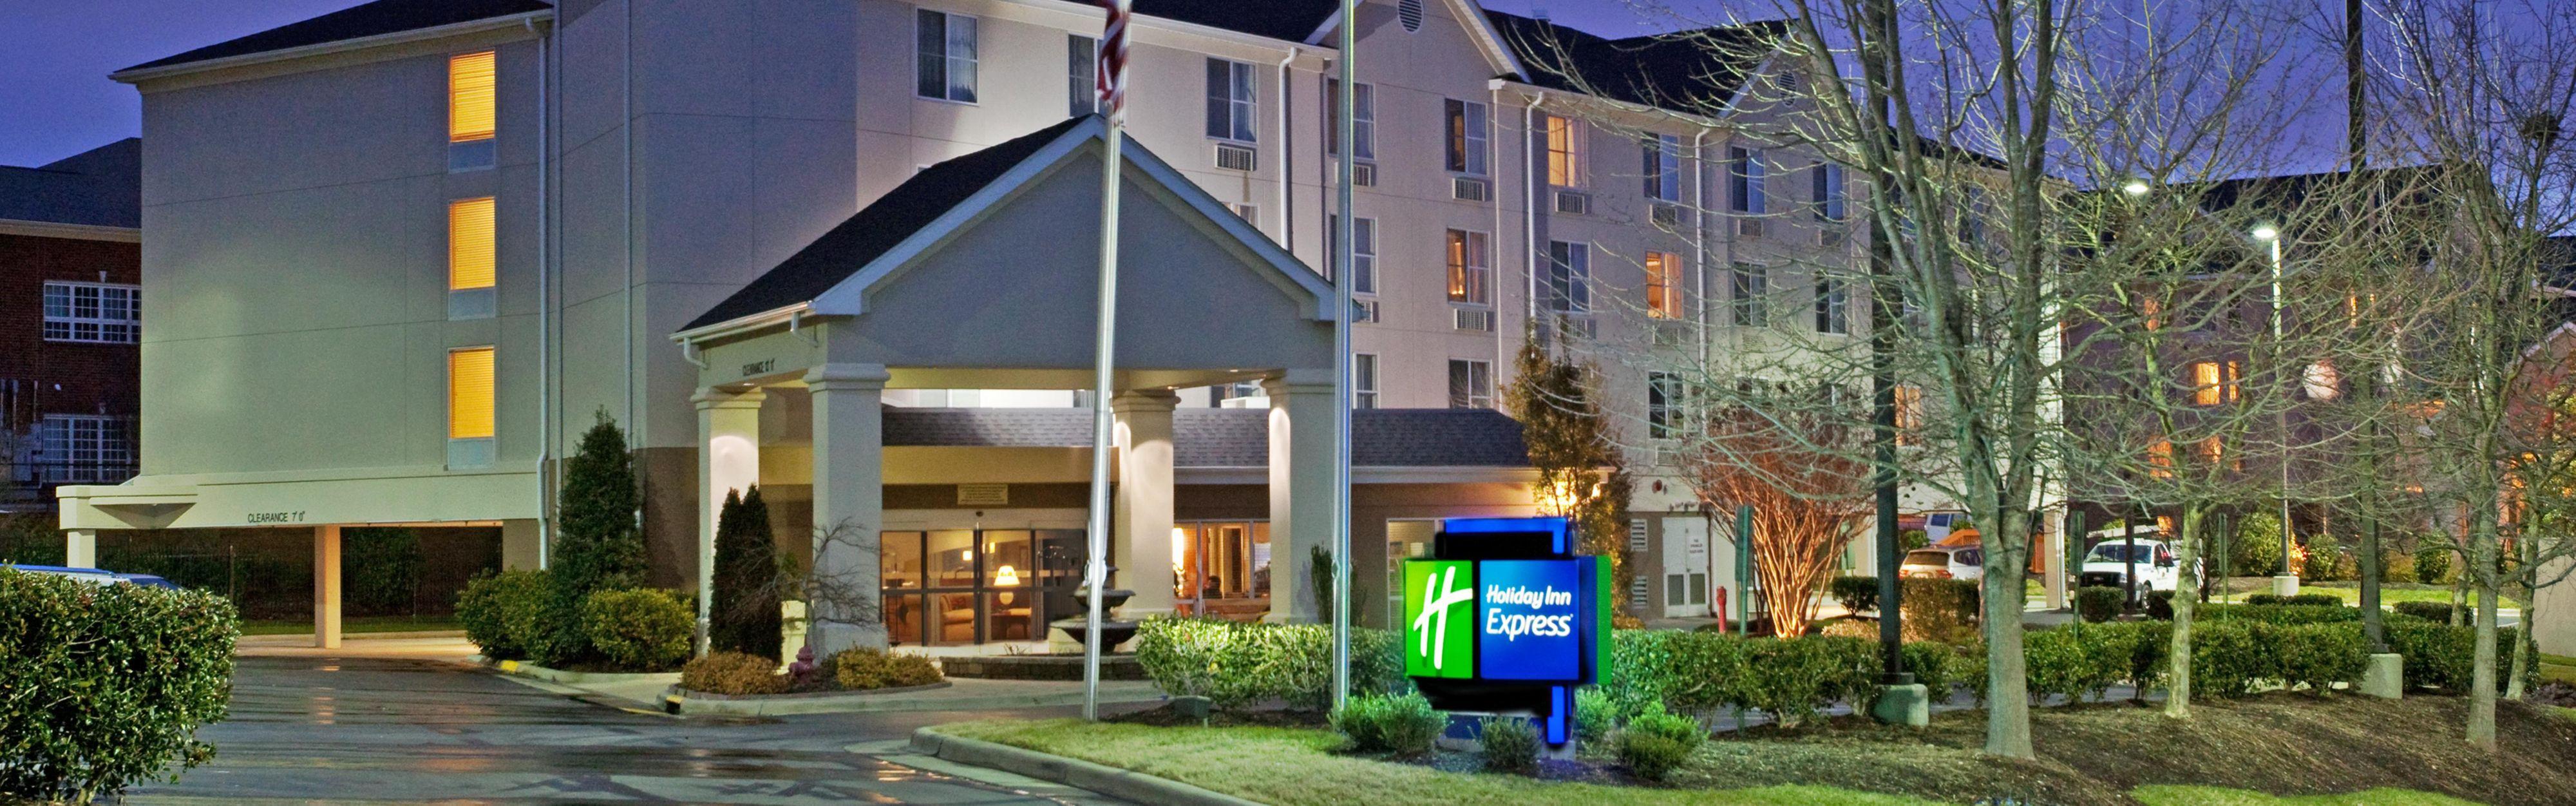 Holiday Inn Express Chapel Hill image 0